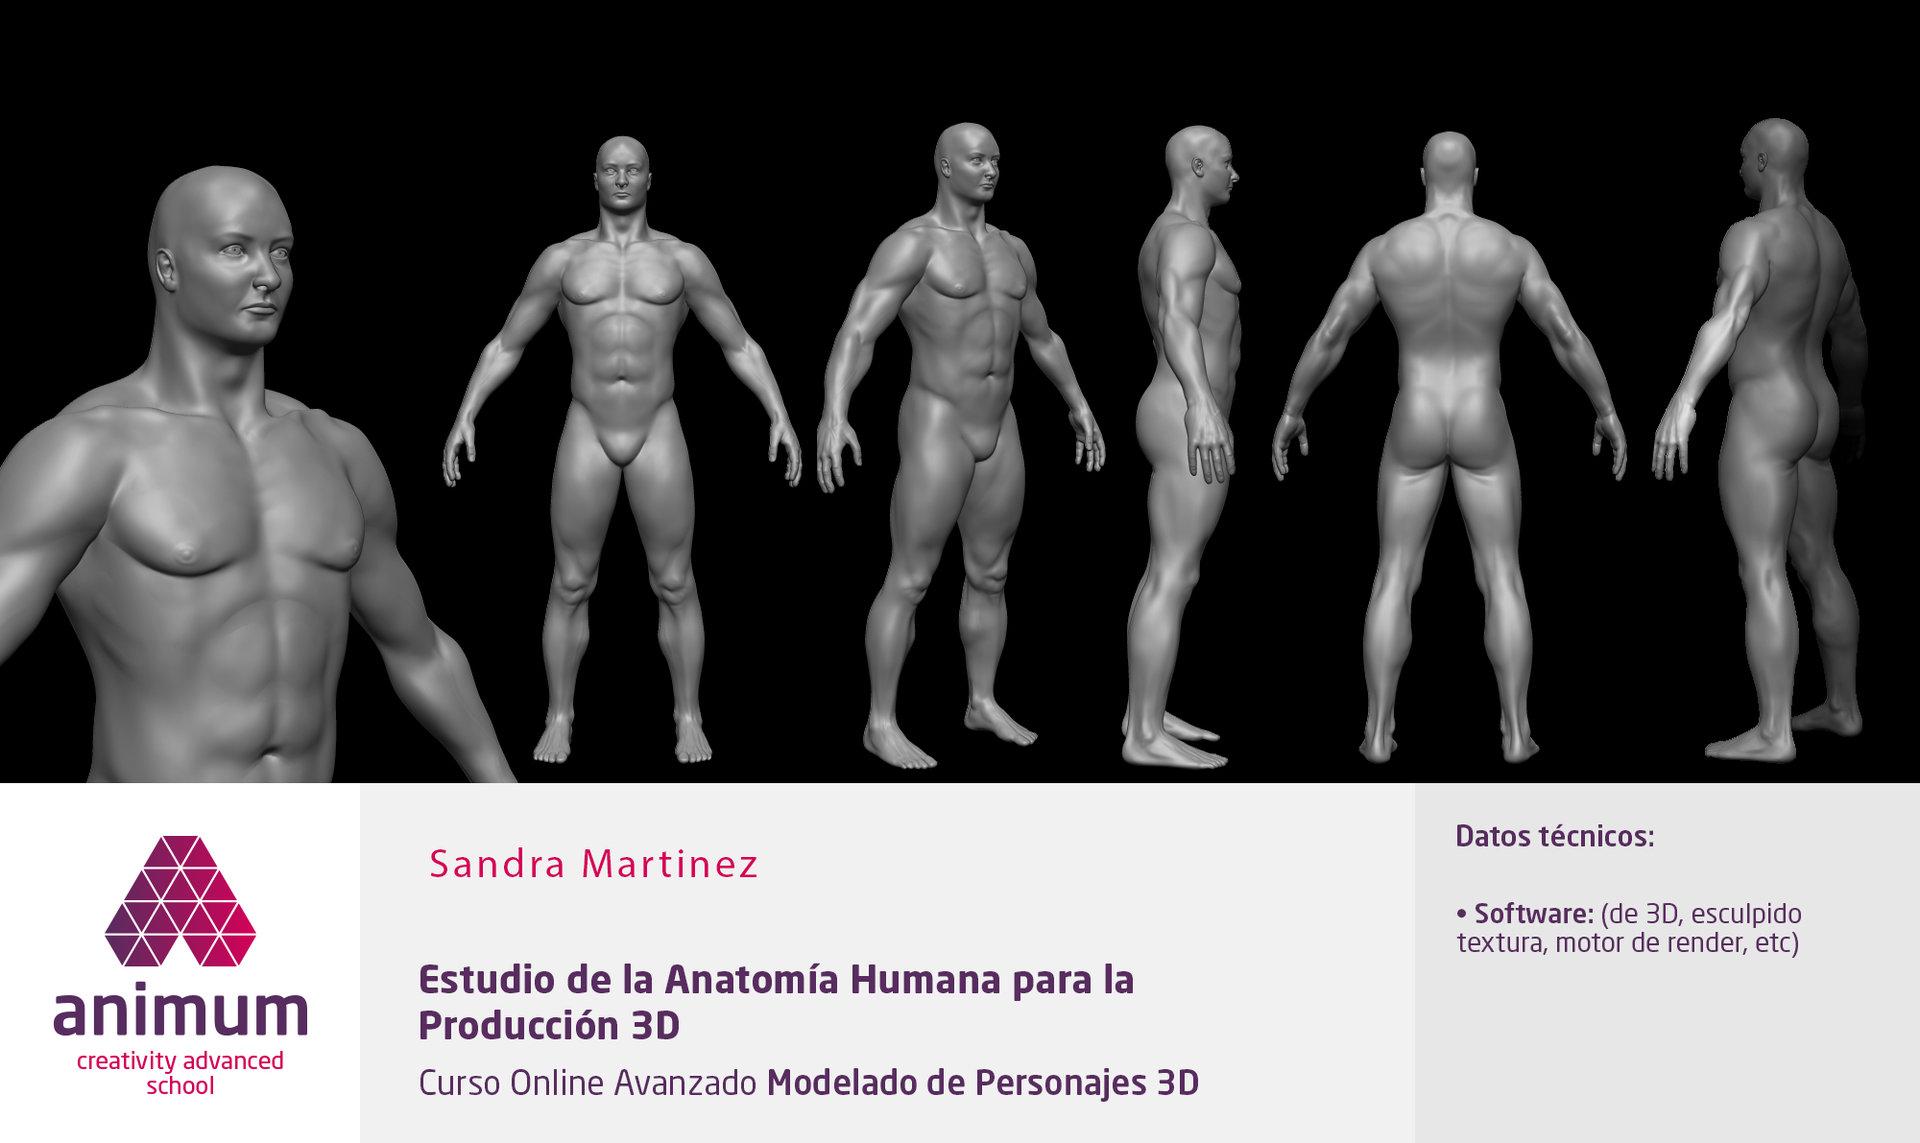 Sandra Martinez - 3D MODELS